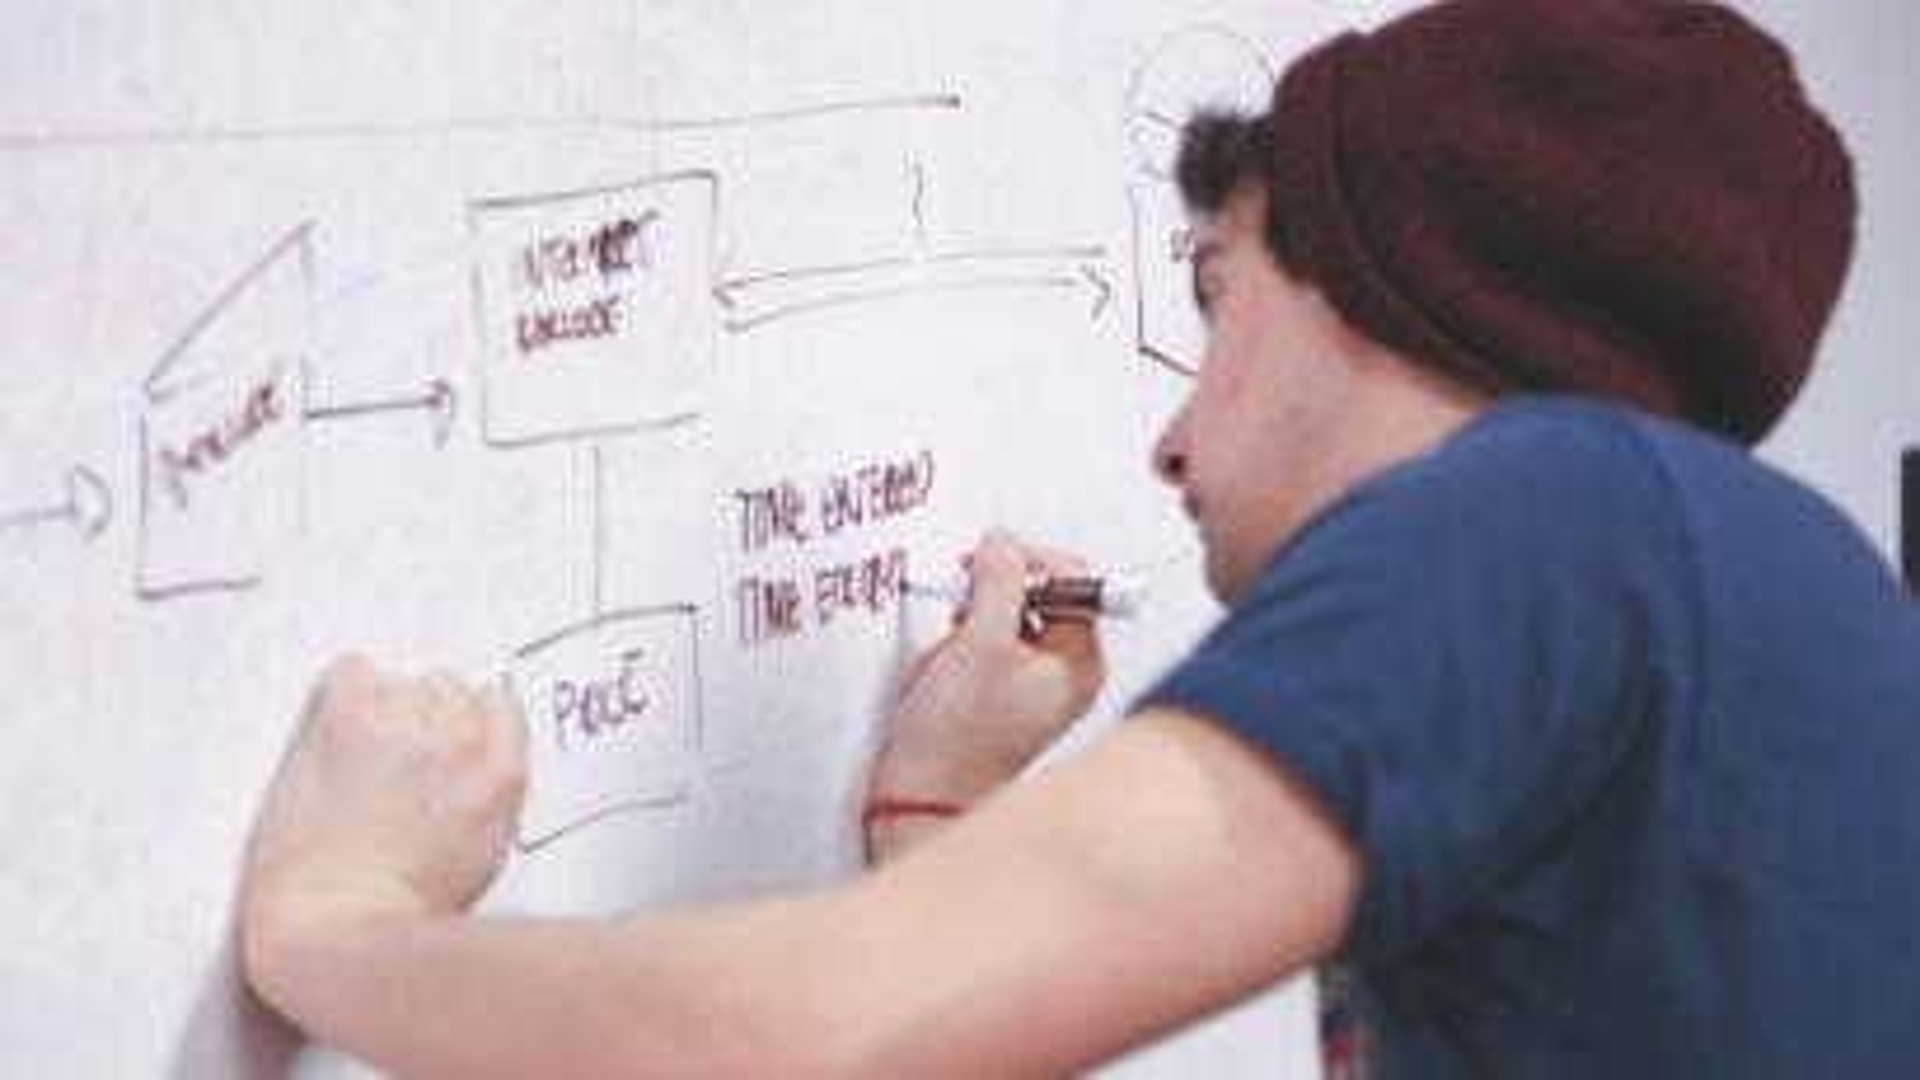 Whiteboard tech coding code interview